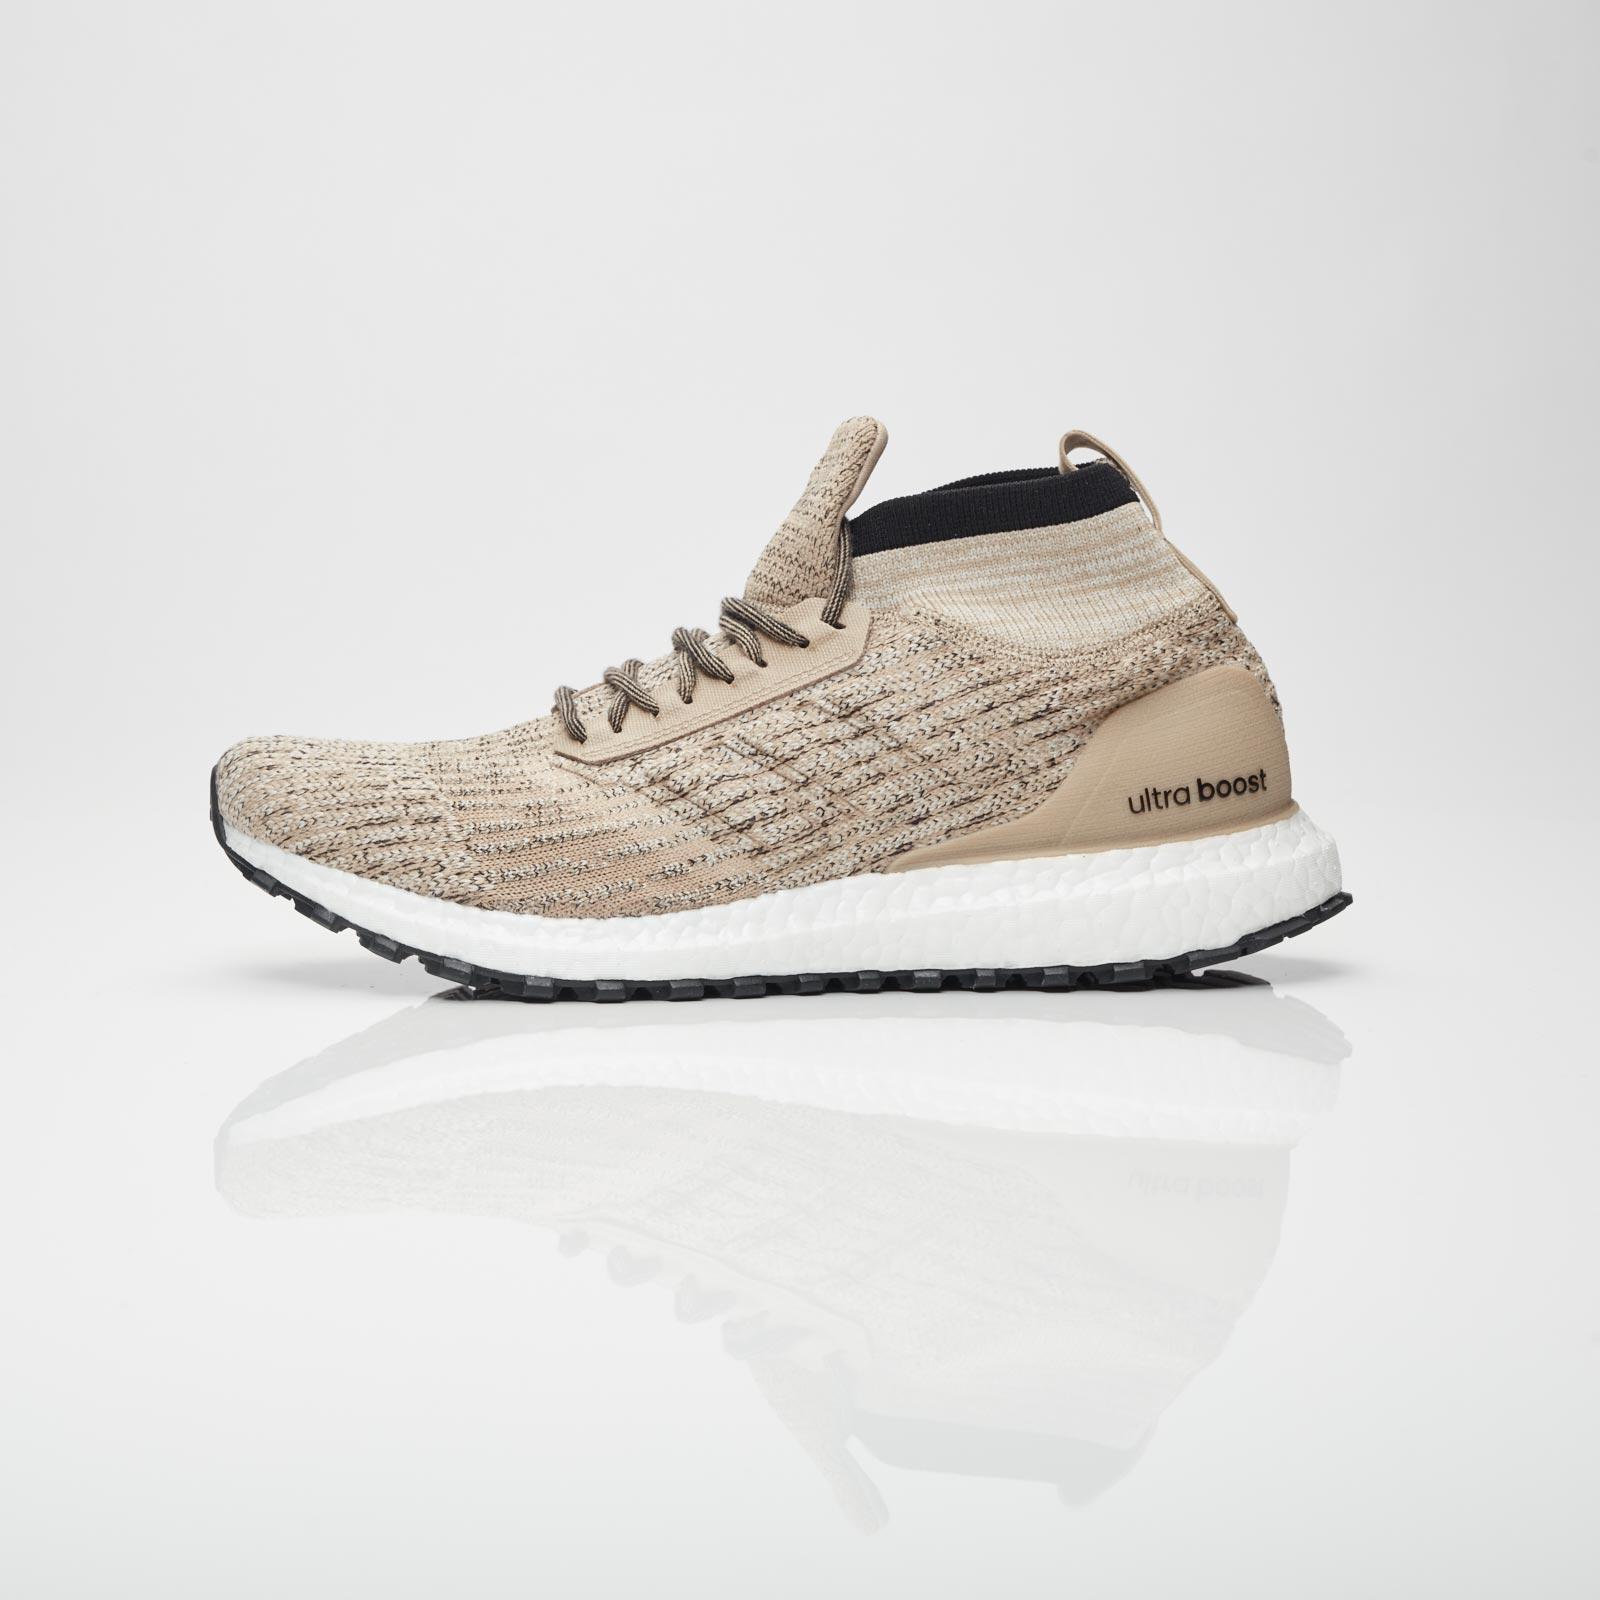 9e406da0c adidas Ultraboost All Terrain LTD - Cg3001 - Sneakersnstuff ...